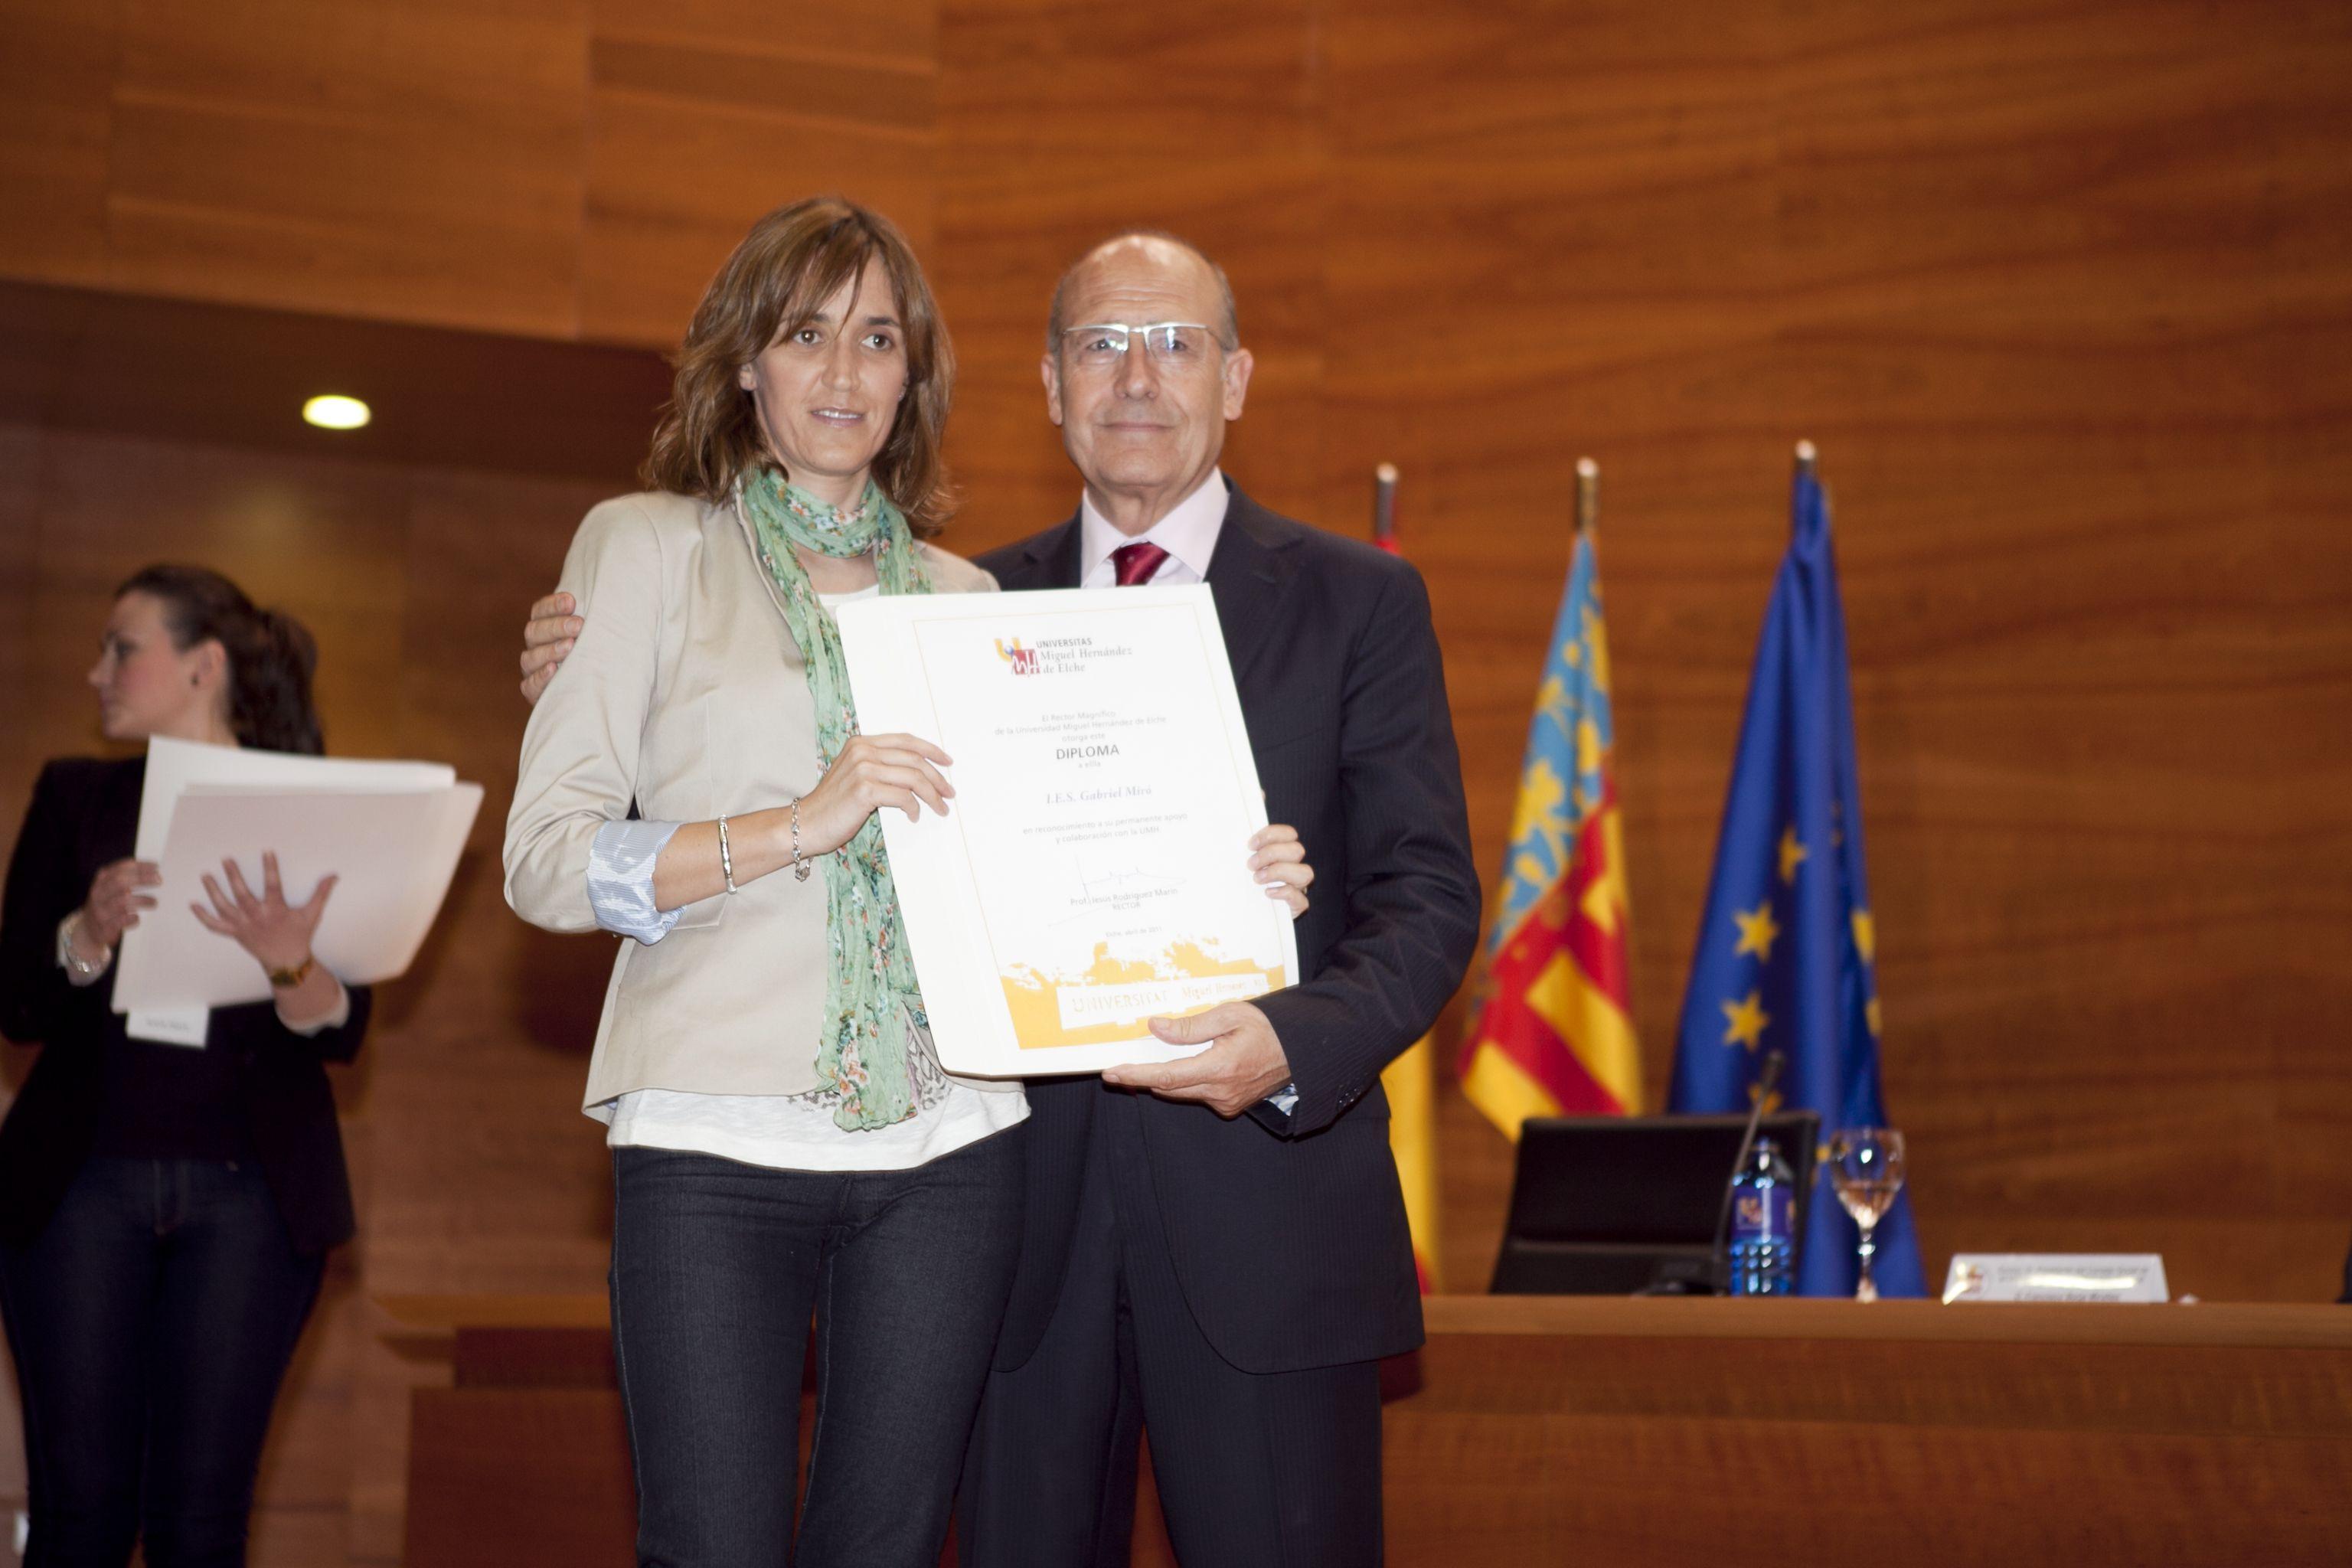 umh-diplomas-rector_mg_6696.jpg